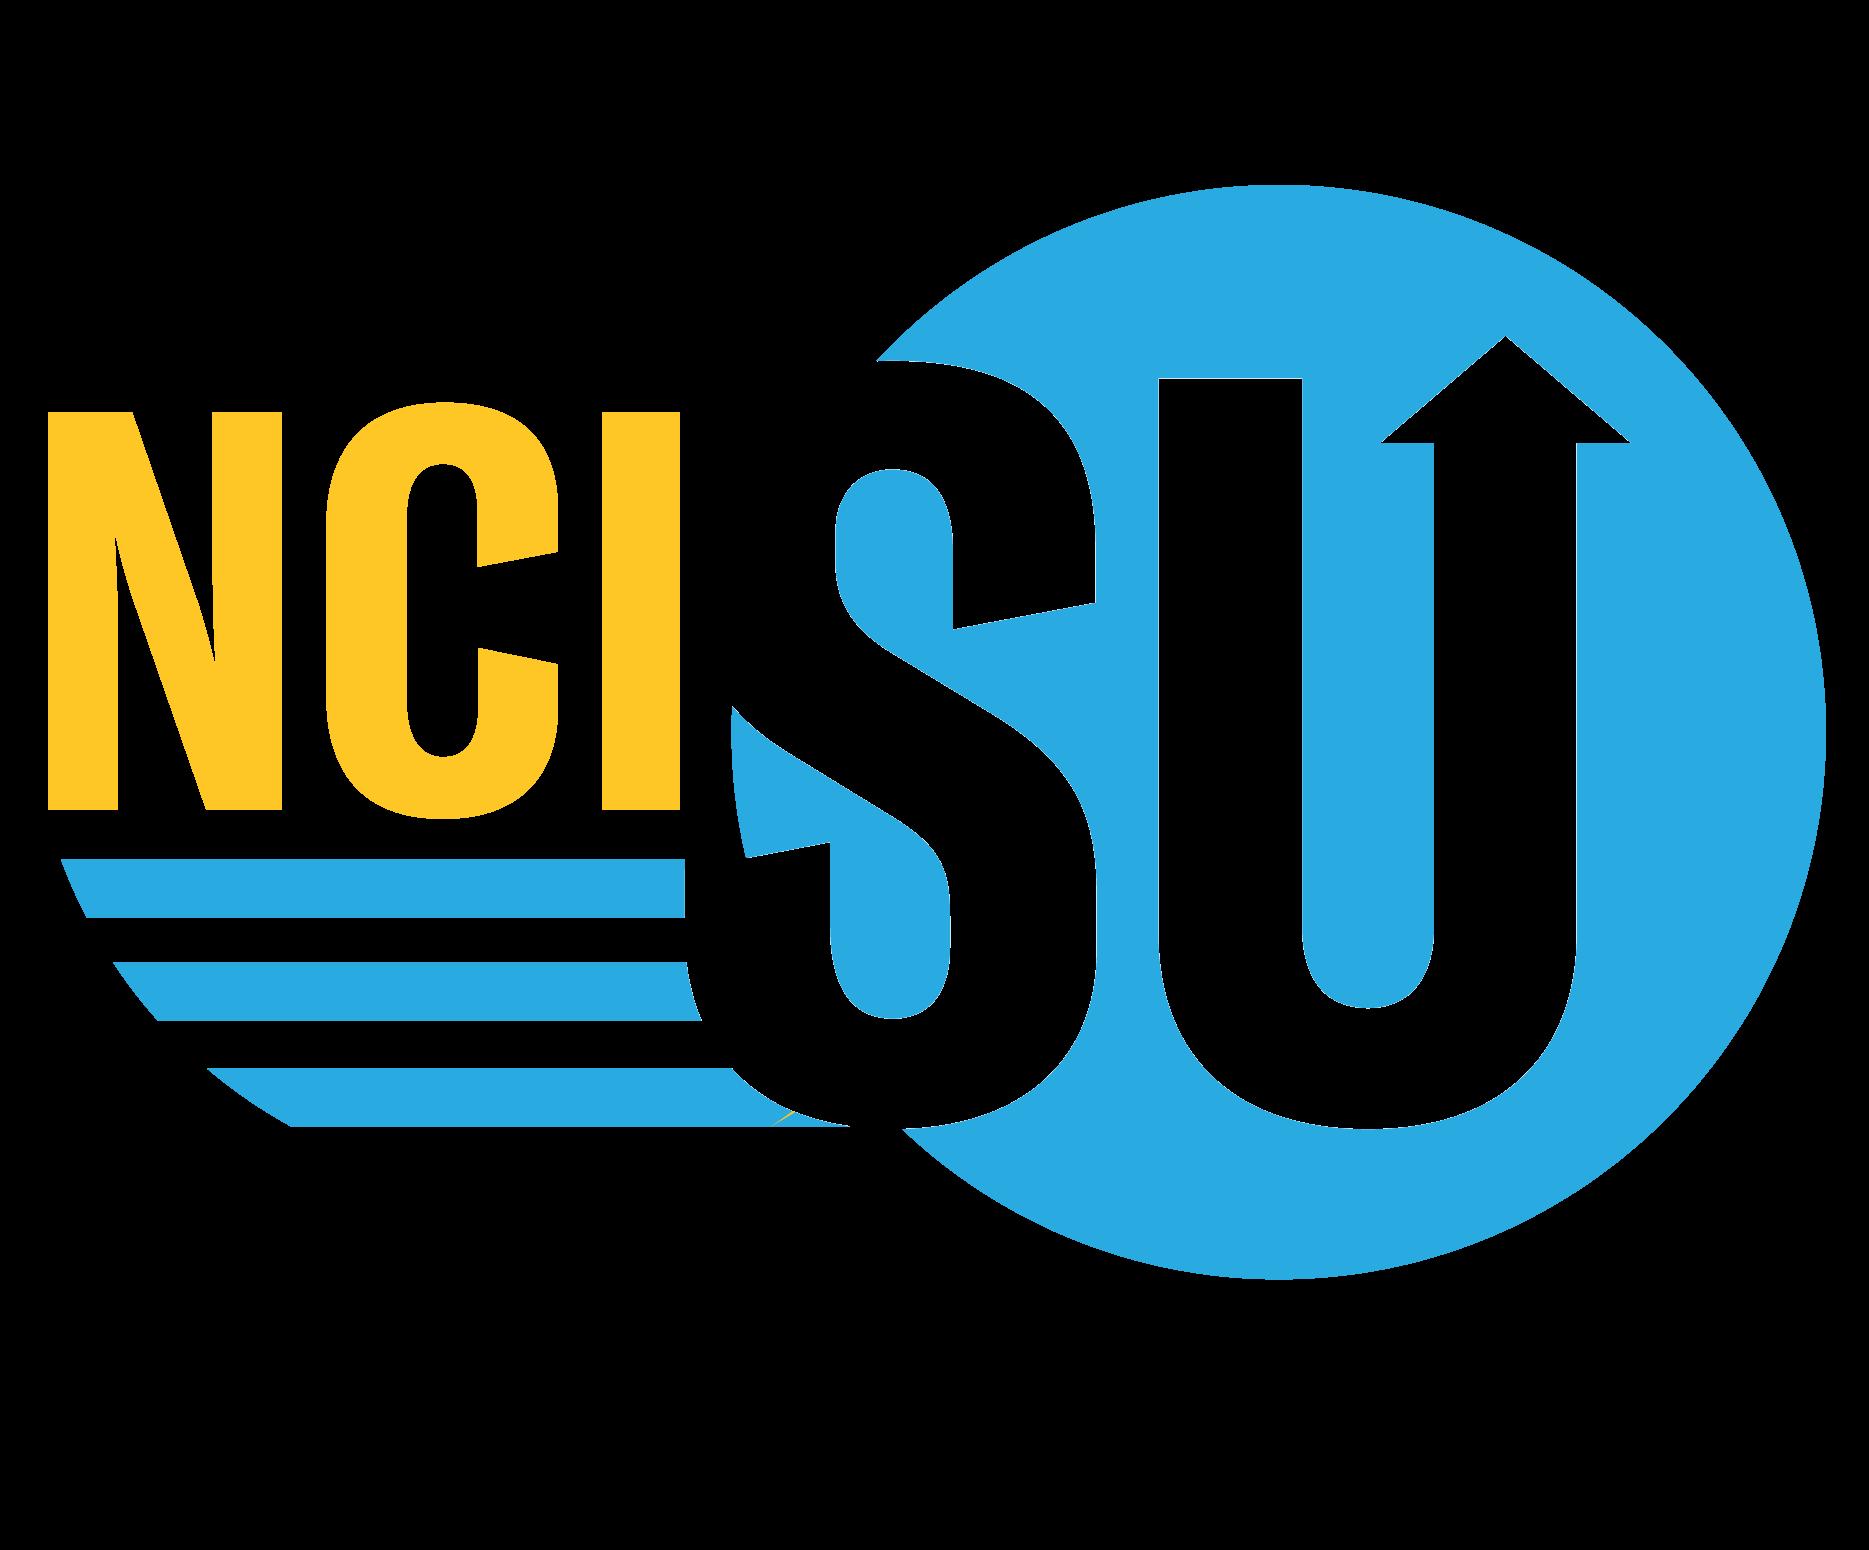 NCISU